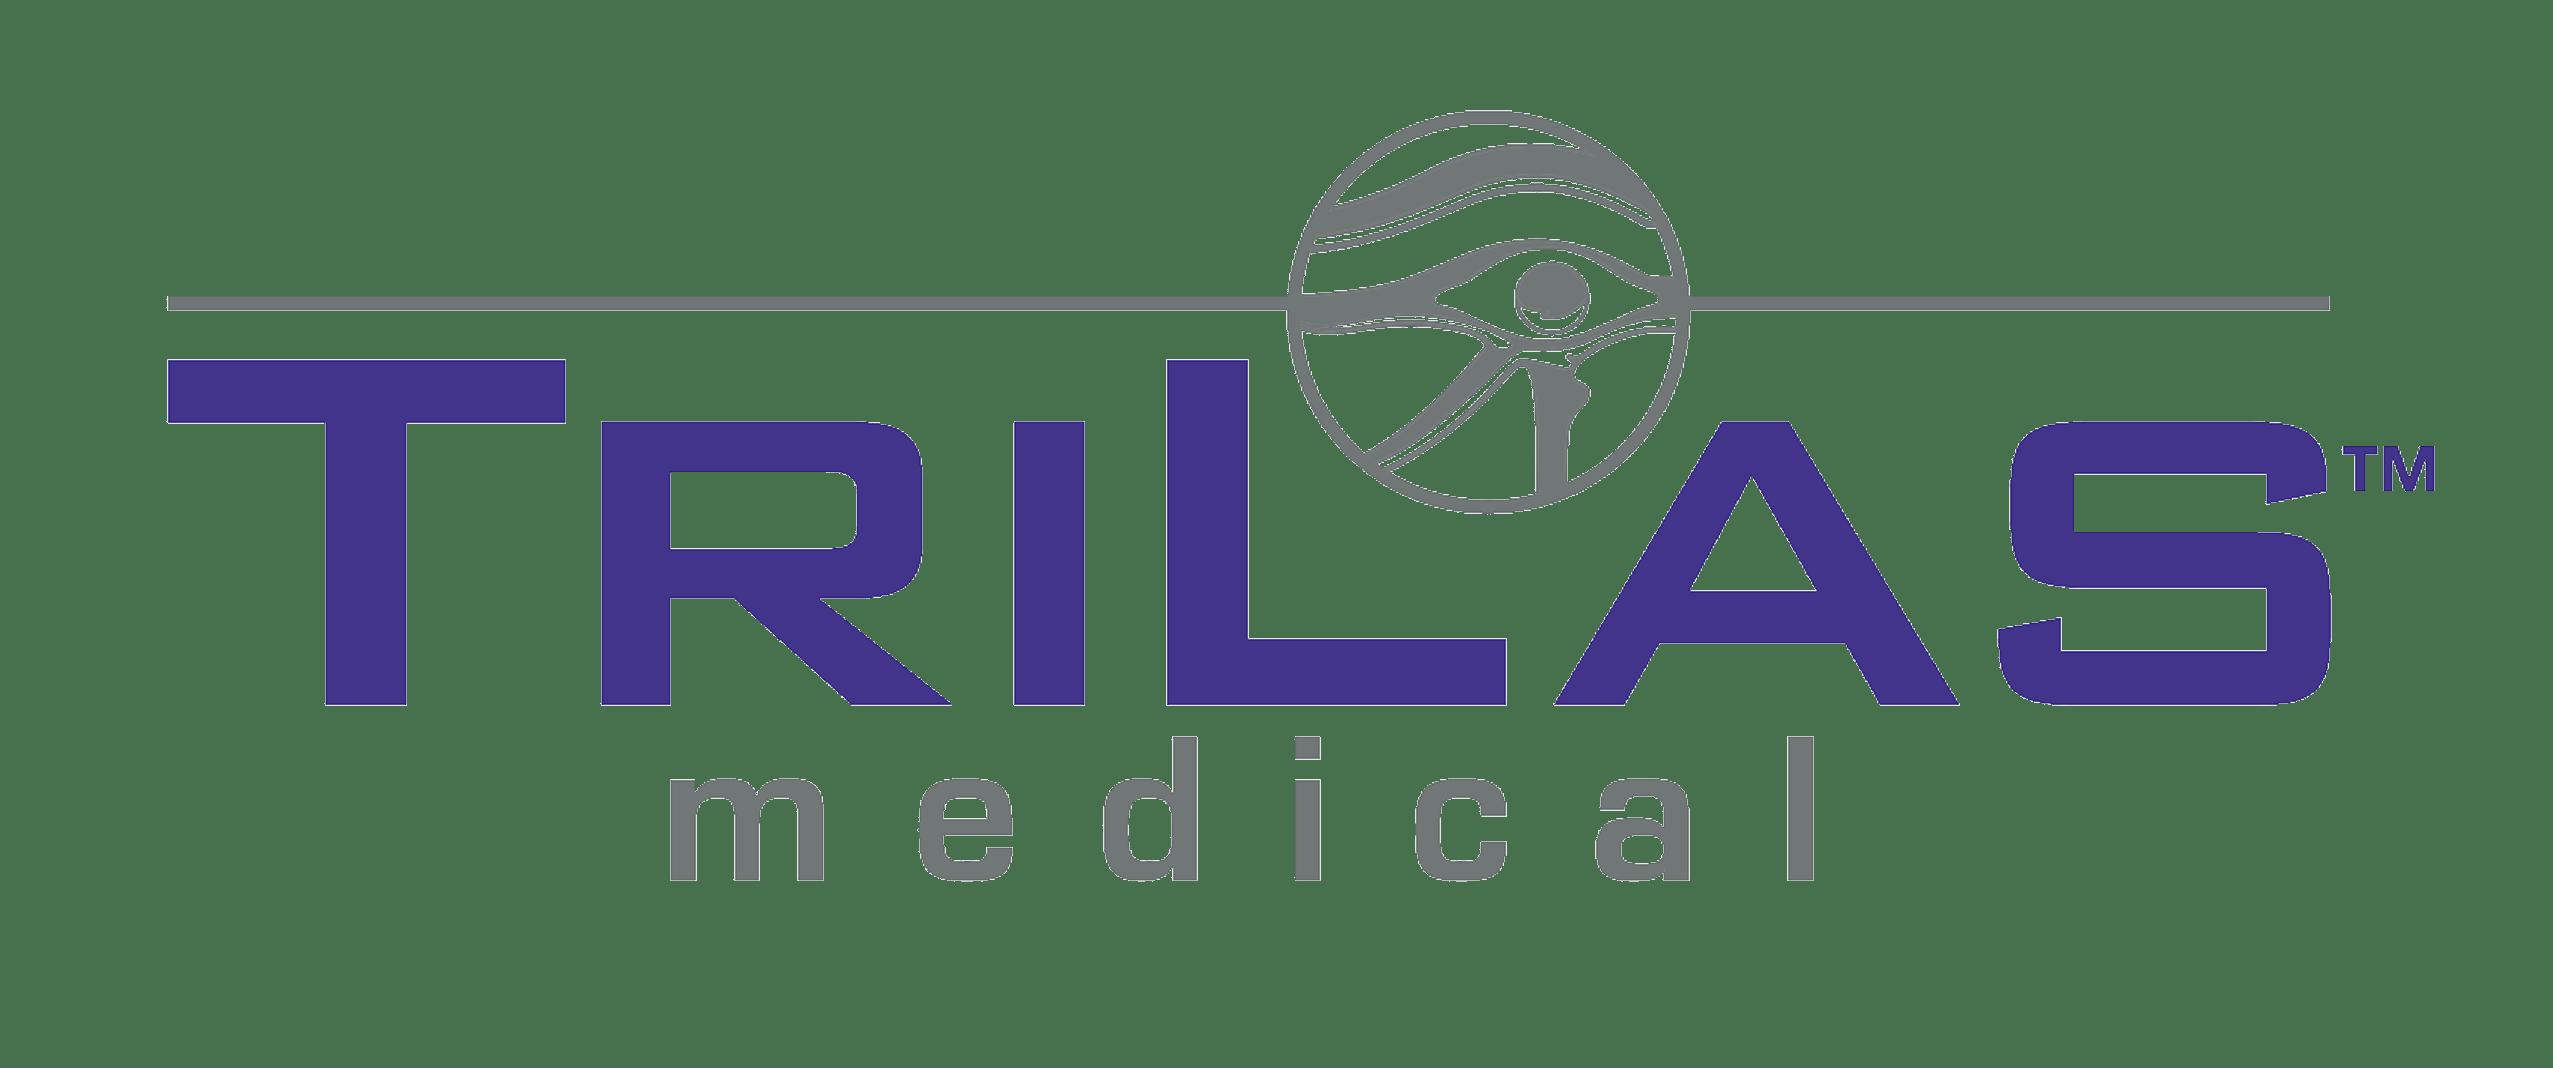 triLas_logo_o_tagline2020